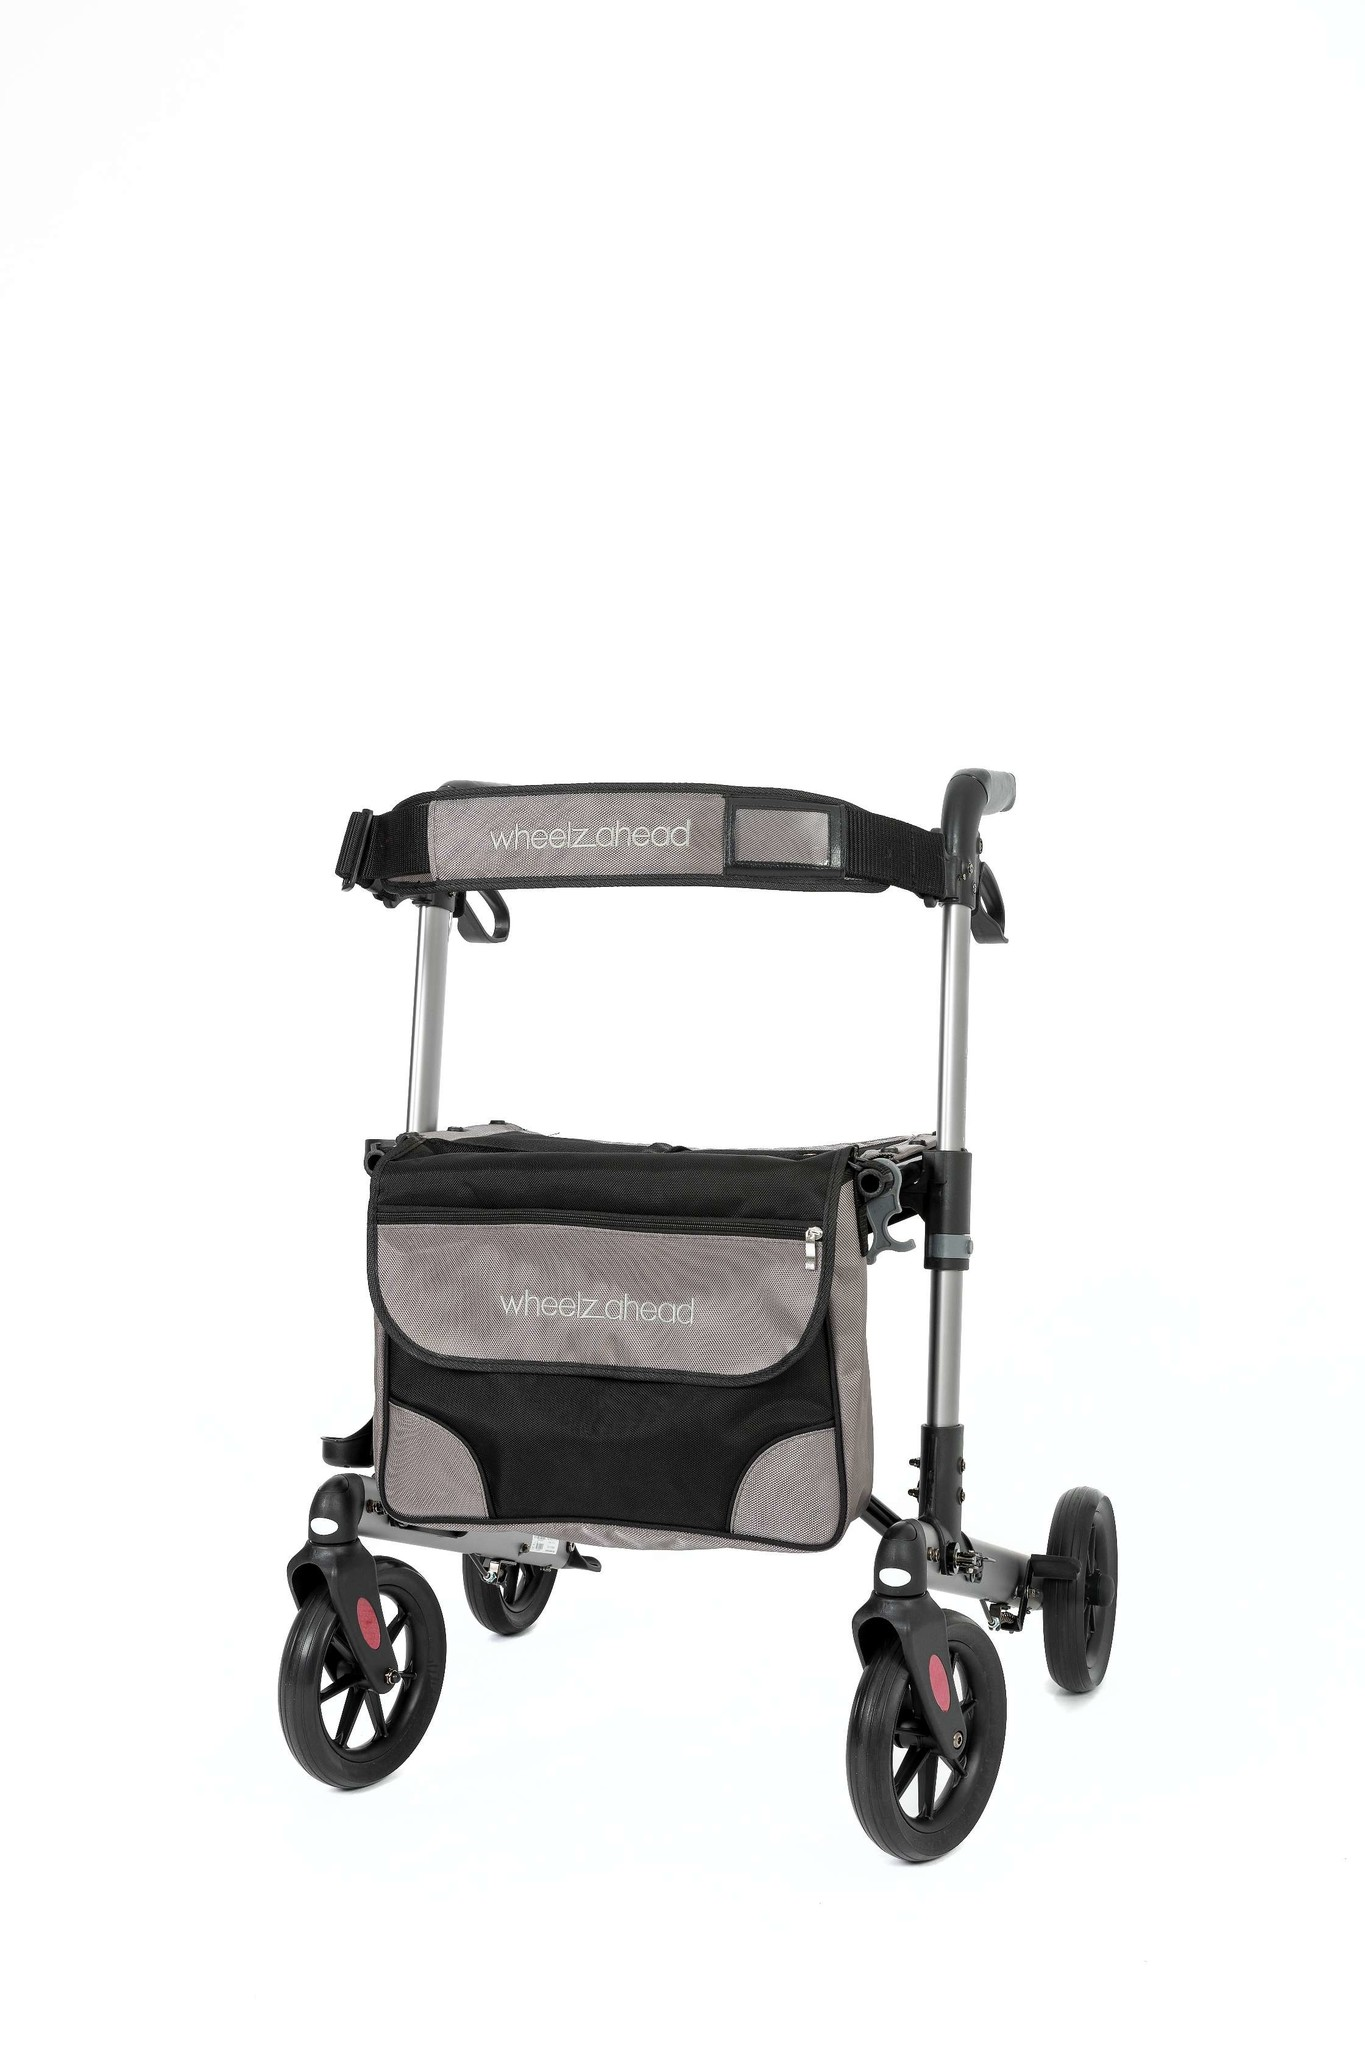 Wheelzahead Verstellbarer Rückengurt TRACK